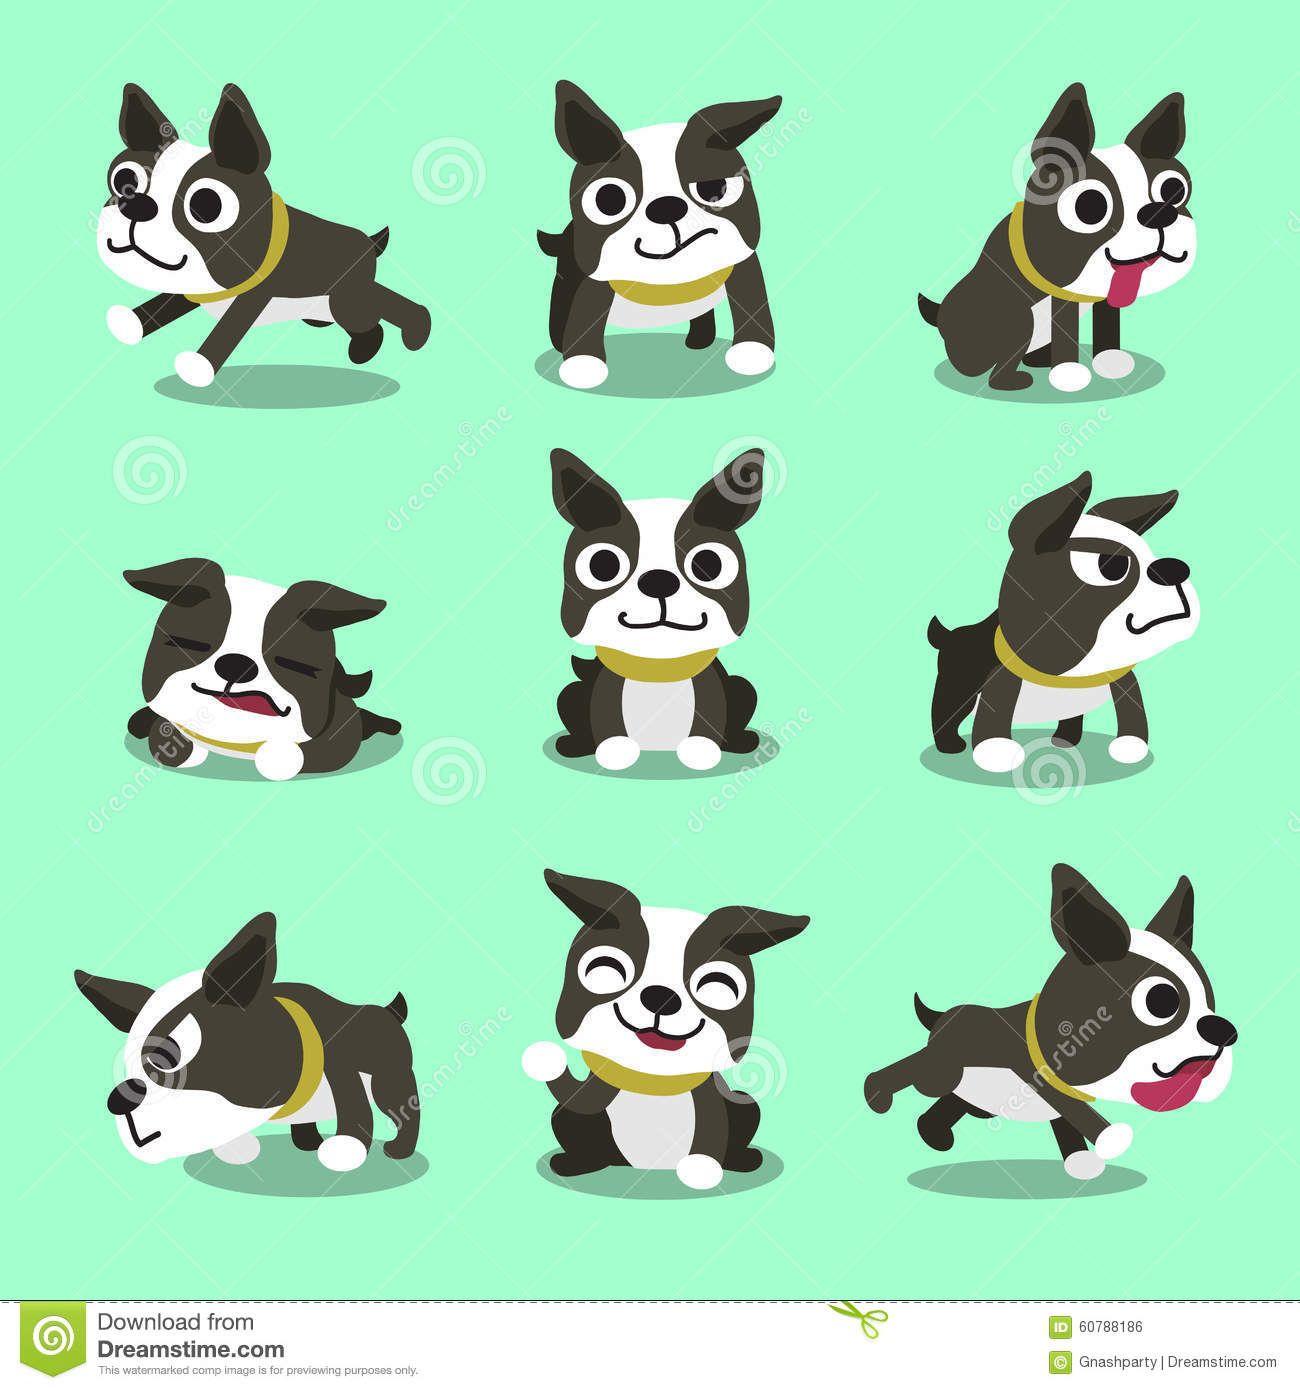 Illustration About Cartoon Character Boston Terrier Dog Poses For Design Illustration Of Character Boston Terrier Funny Boston Terrier Dog Boston Terrier Art